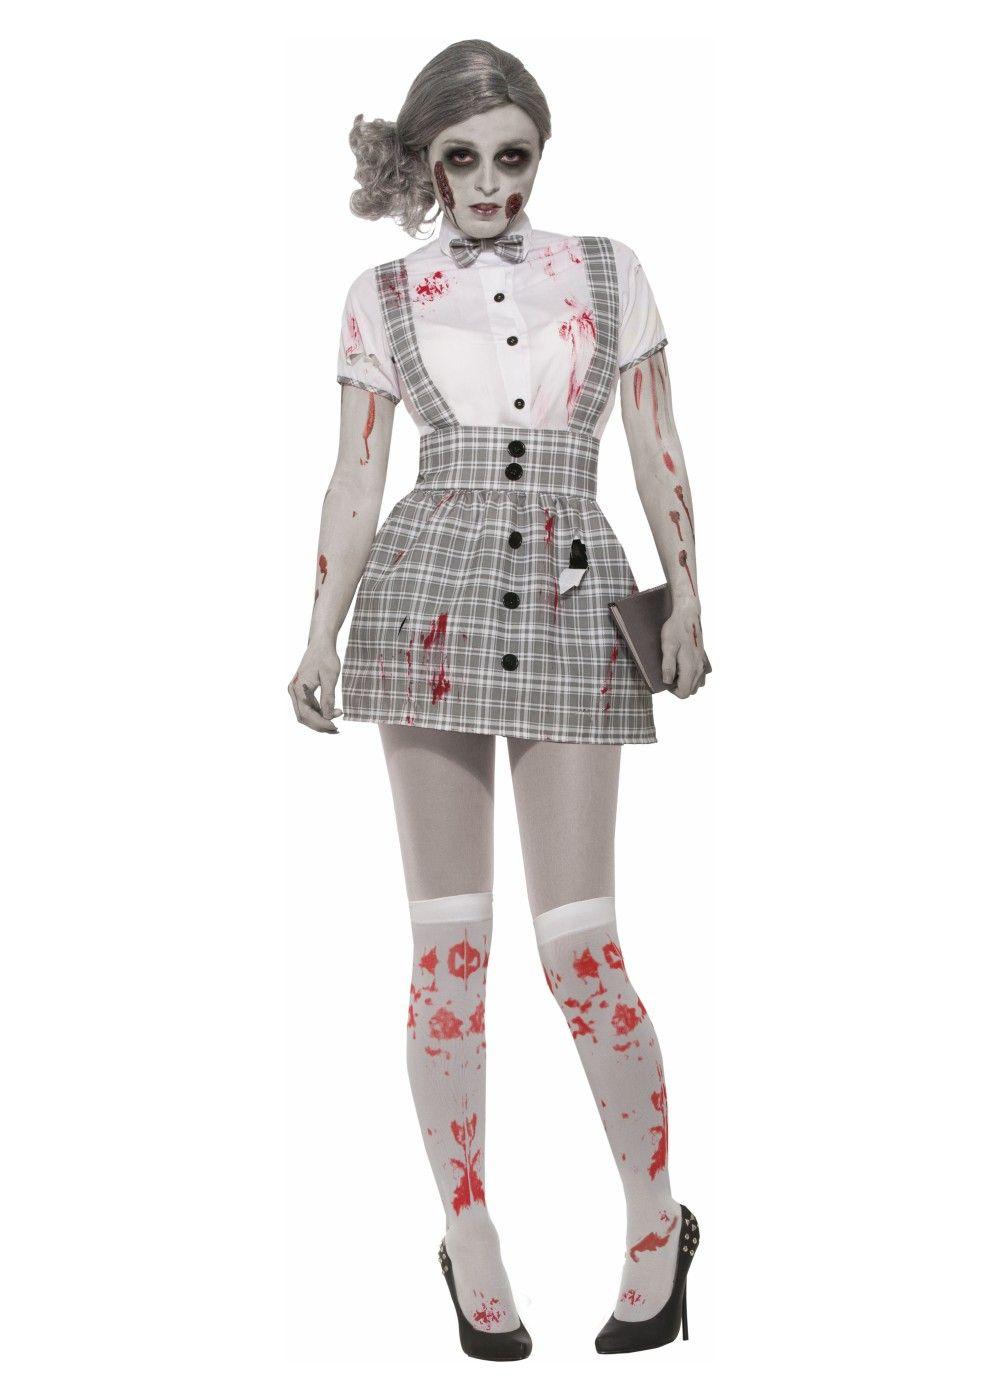 LADIES WOMENS ADULTS SCARY SCHOOLGIRL FANCY DRESS COSTUME ADD WIG HALLOWEEN